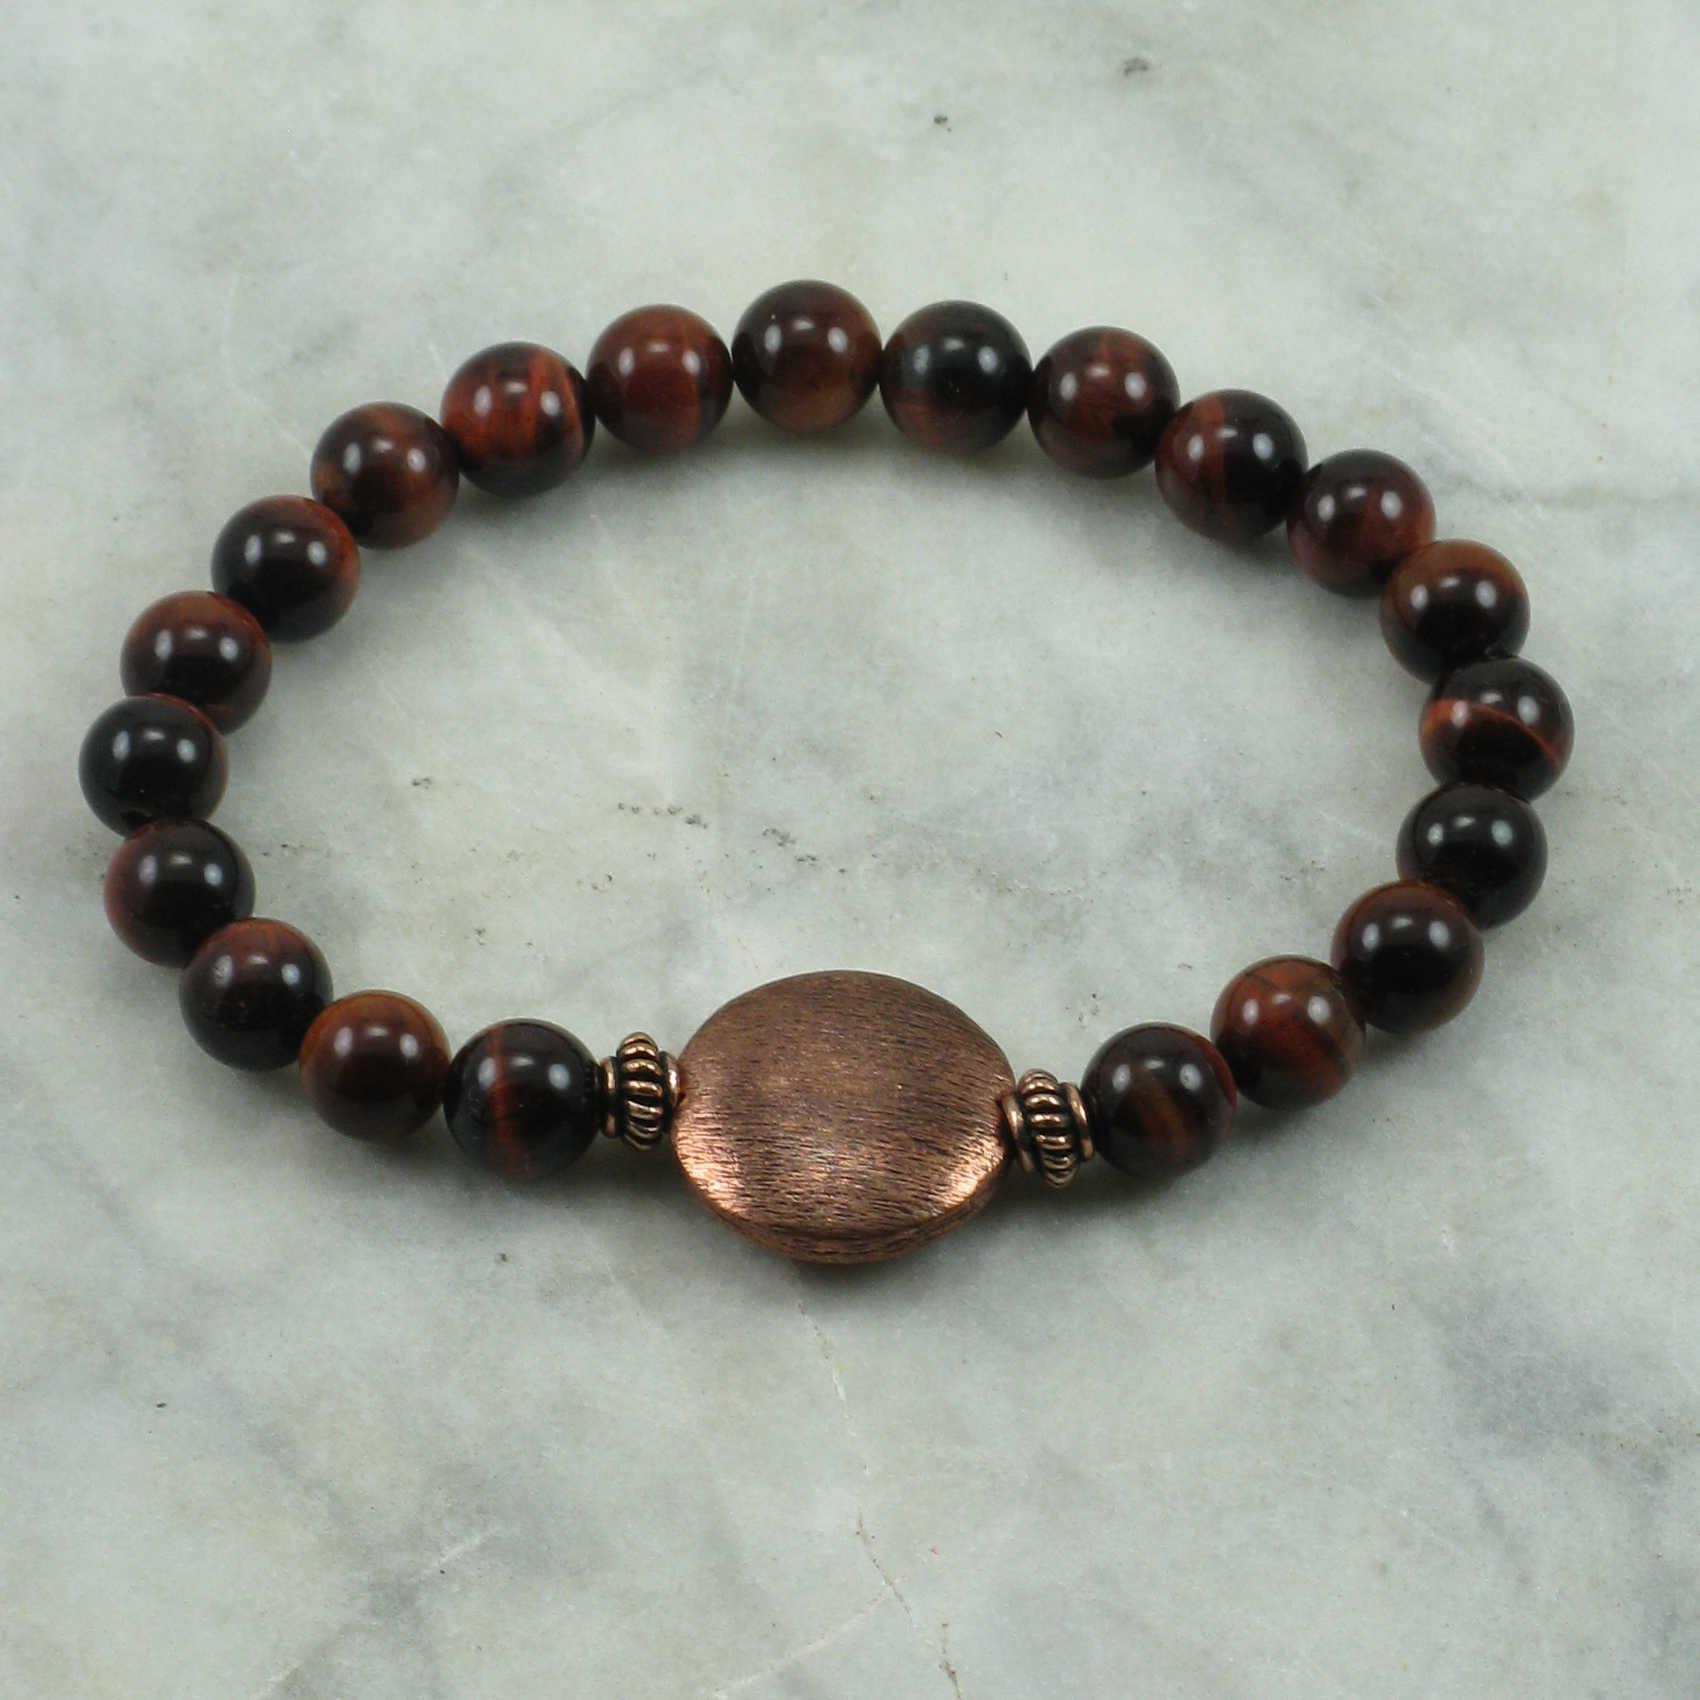 Tiger eye buddhist meditation beads